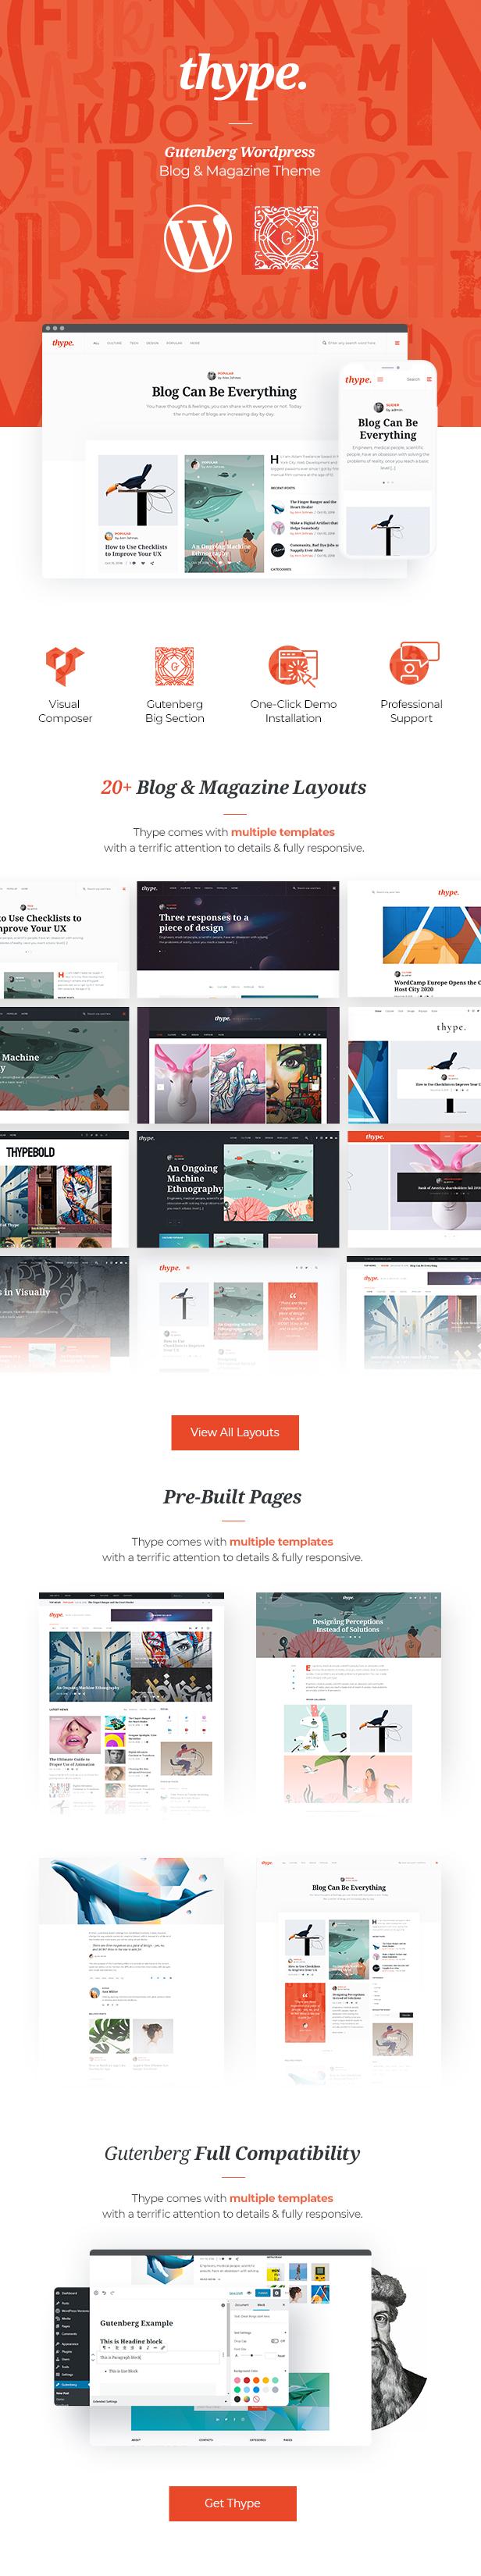 Thype | Multi-concept blog and magazine WordPress theme - 2